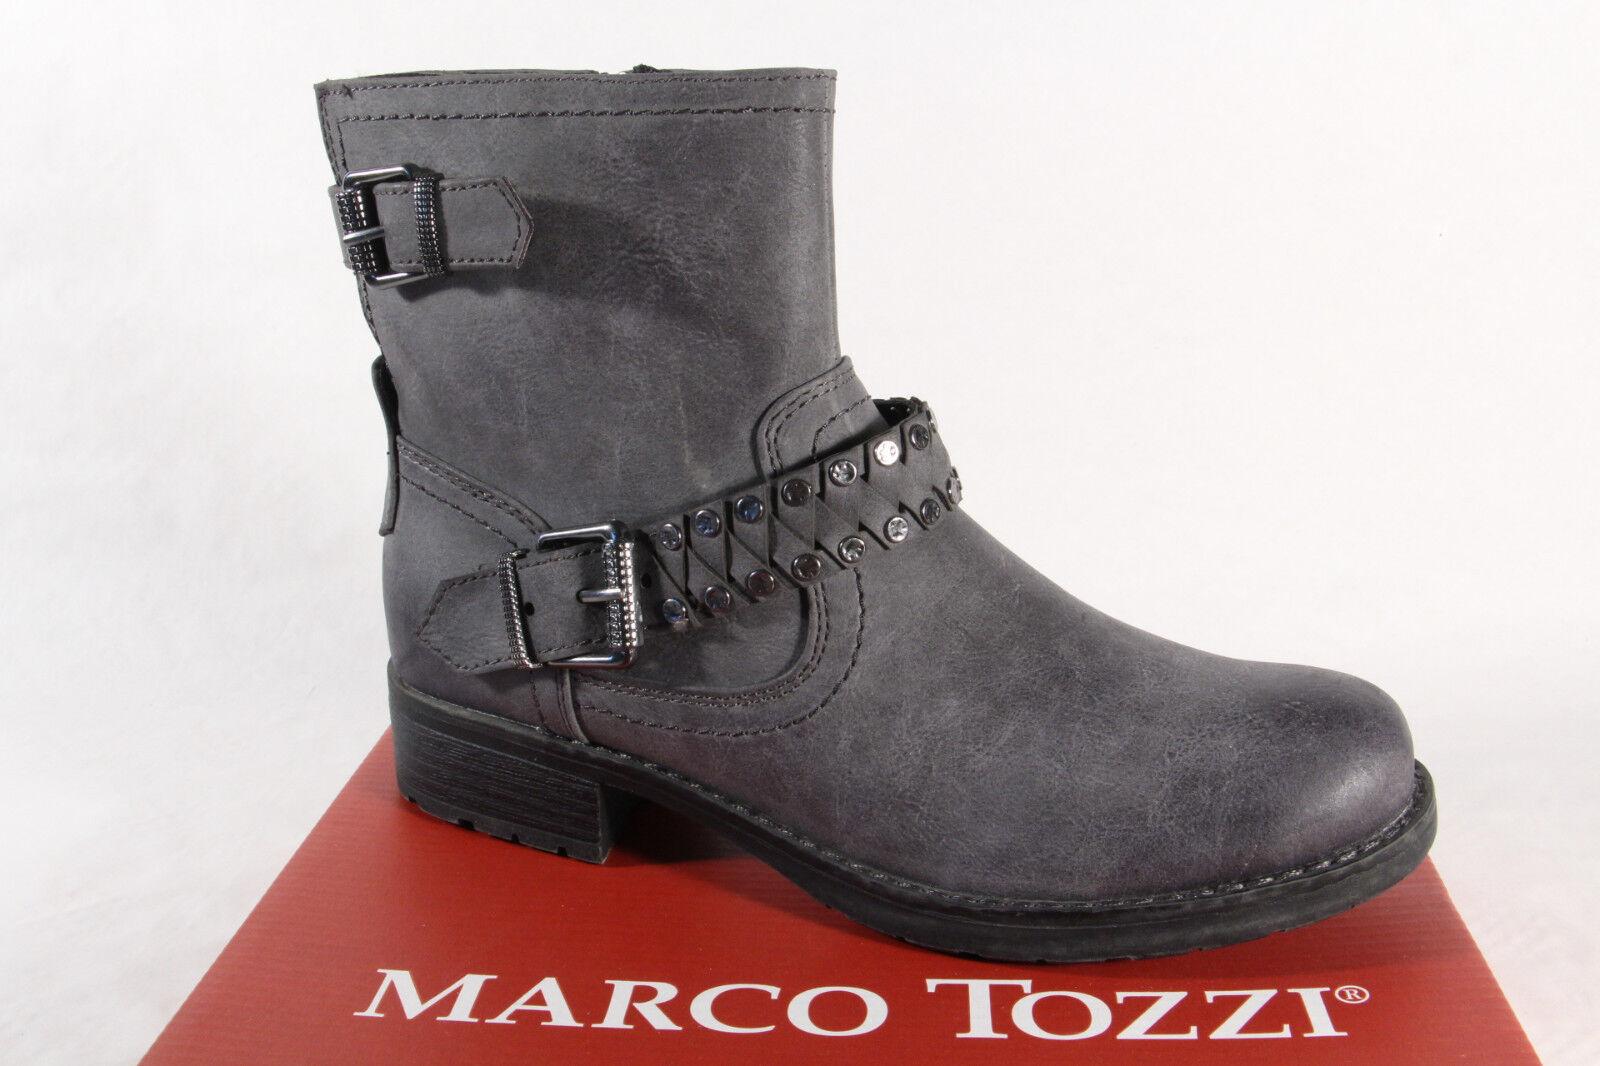 Marco Tozzi 25800 grau Damen Stiefel, Stiefelette, Stiefel grau 25800 25800 NEU 8738f0